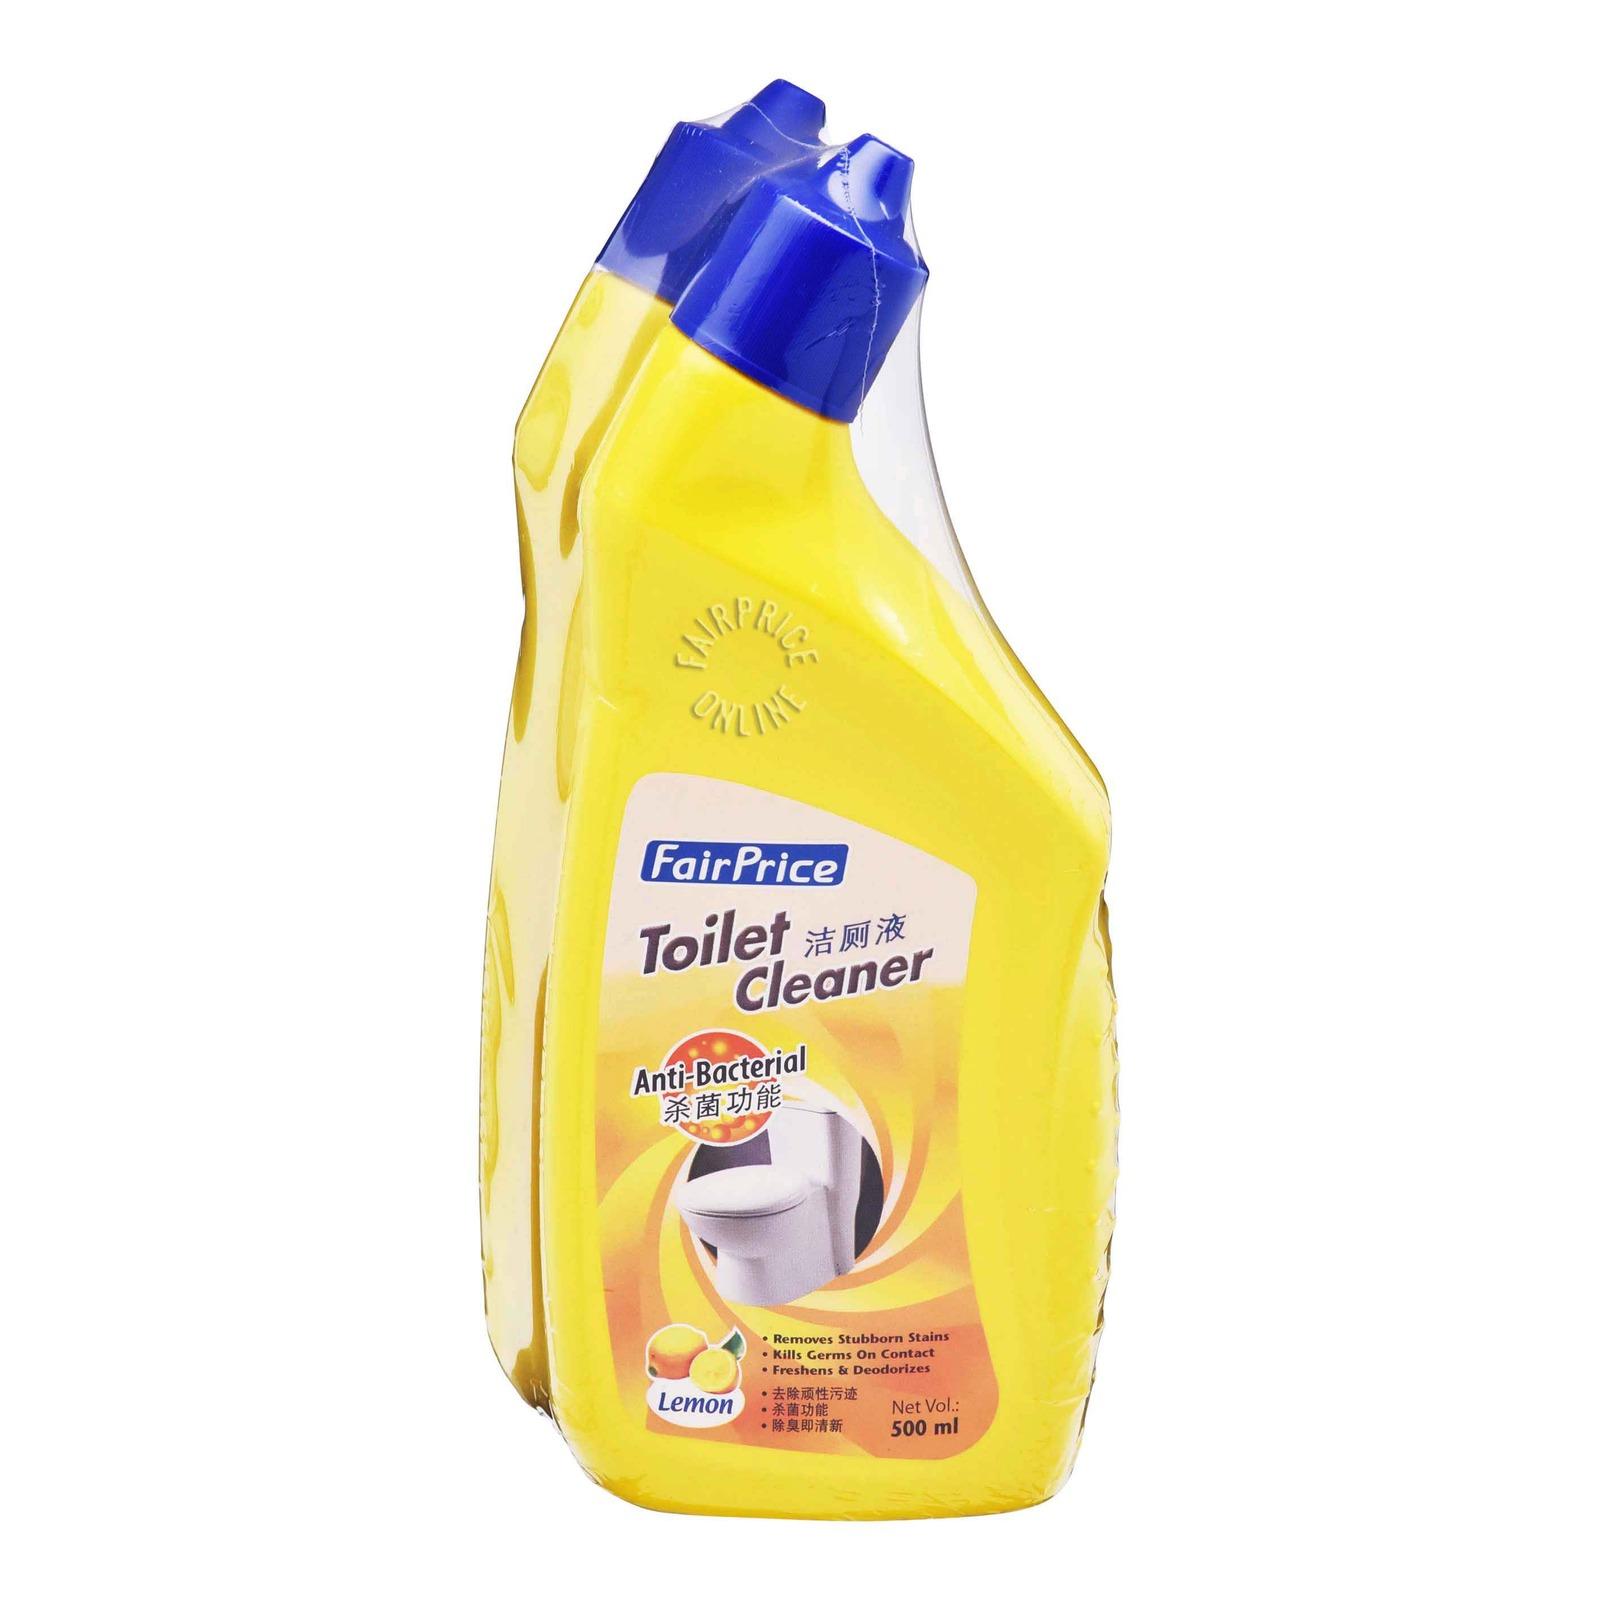 FairPrice Anti-Bacterial Toilet Cleaner - Lemon